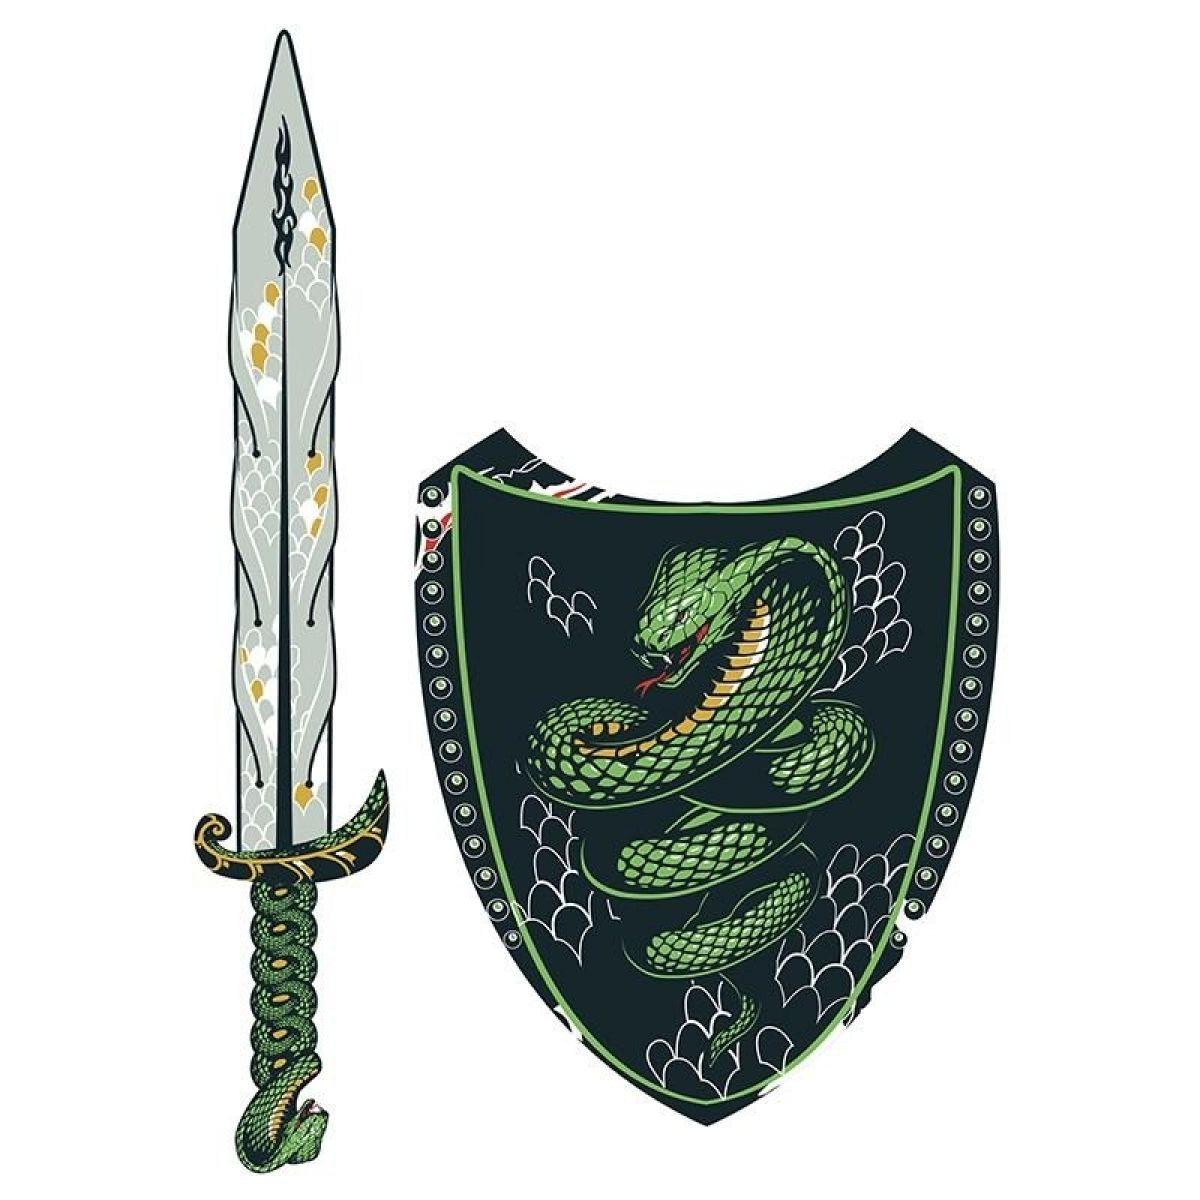 HM Studio Meč a štít Had